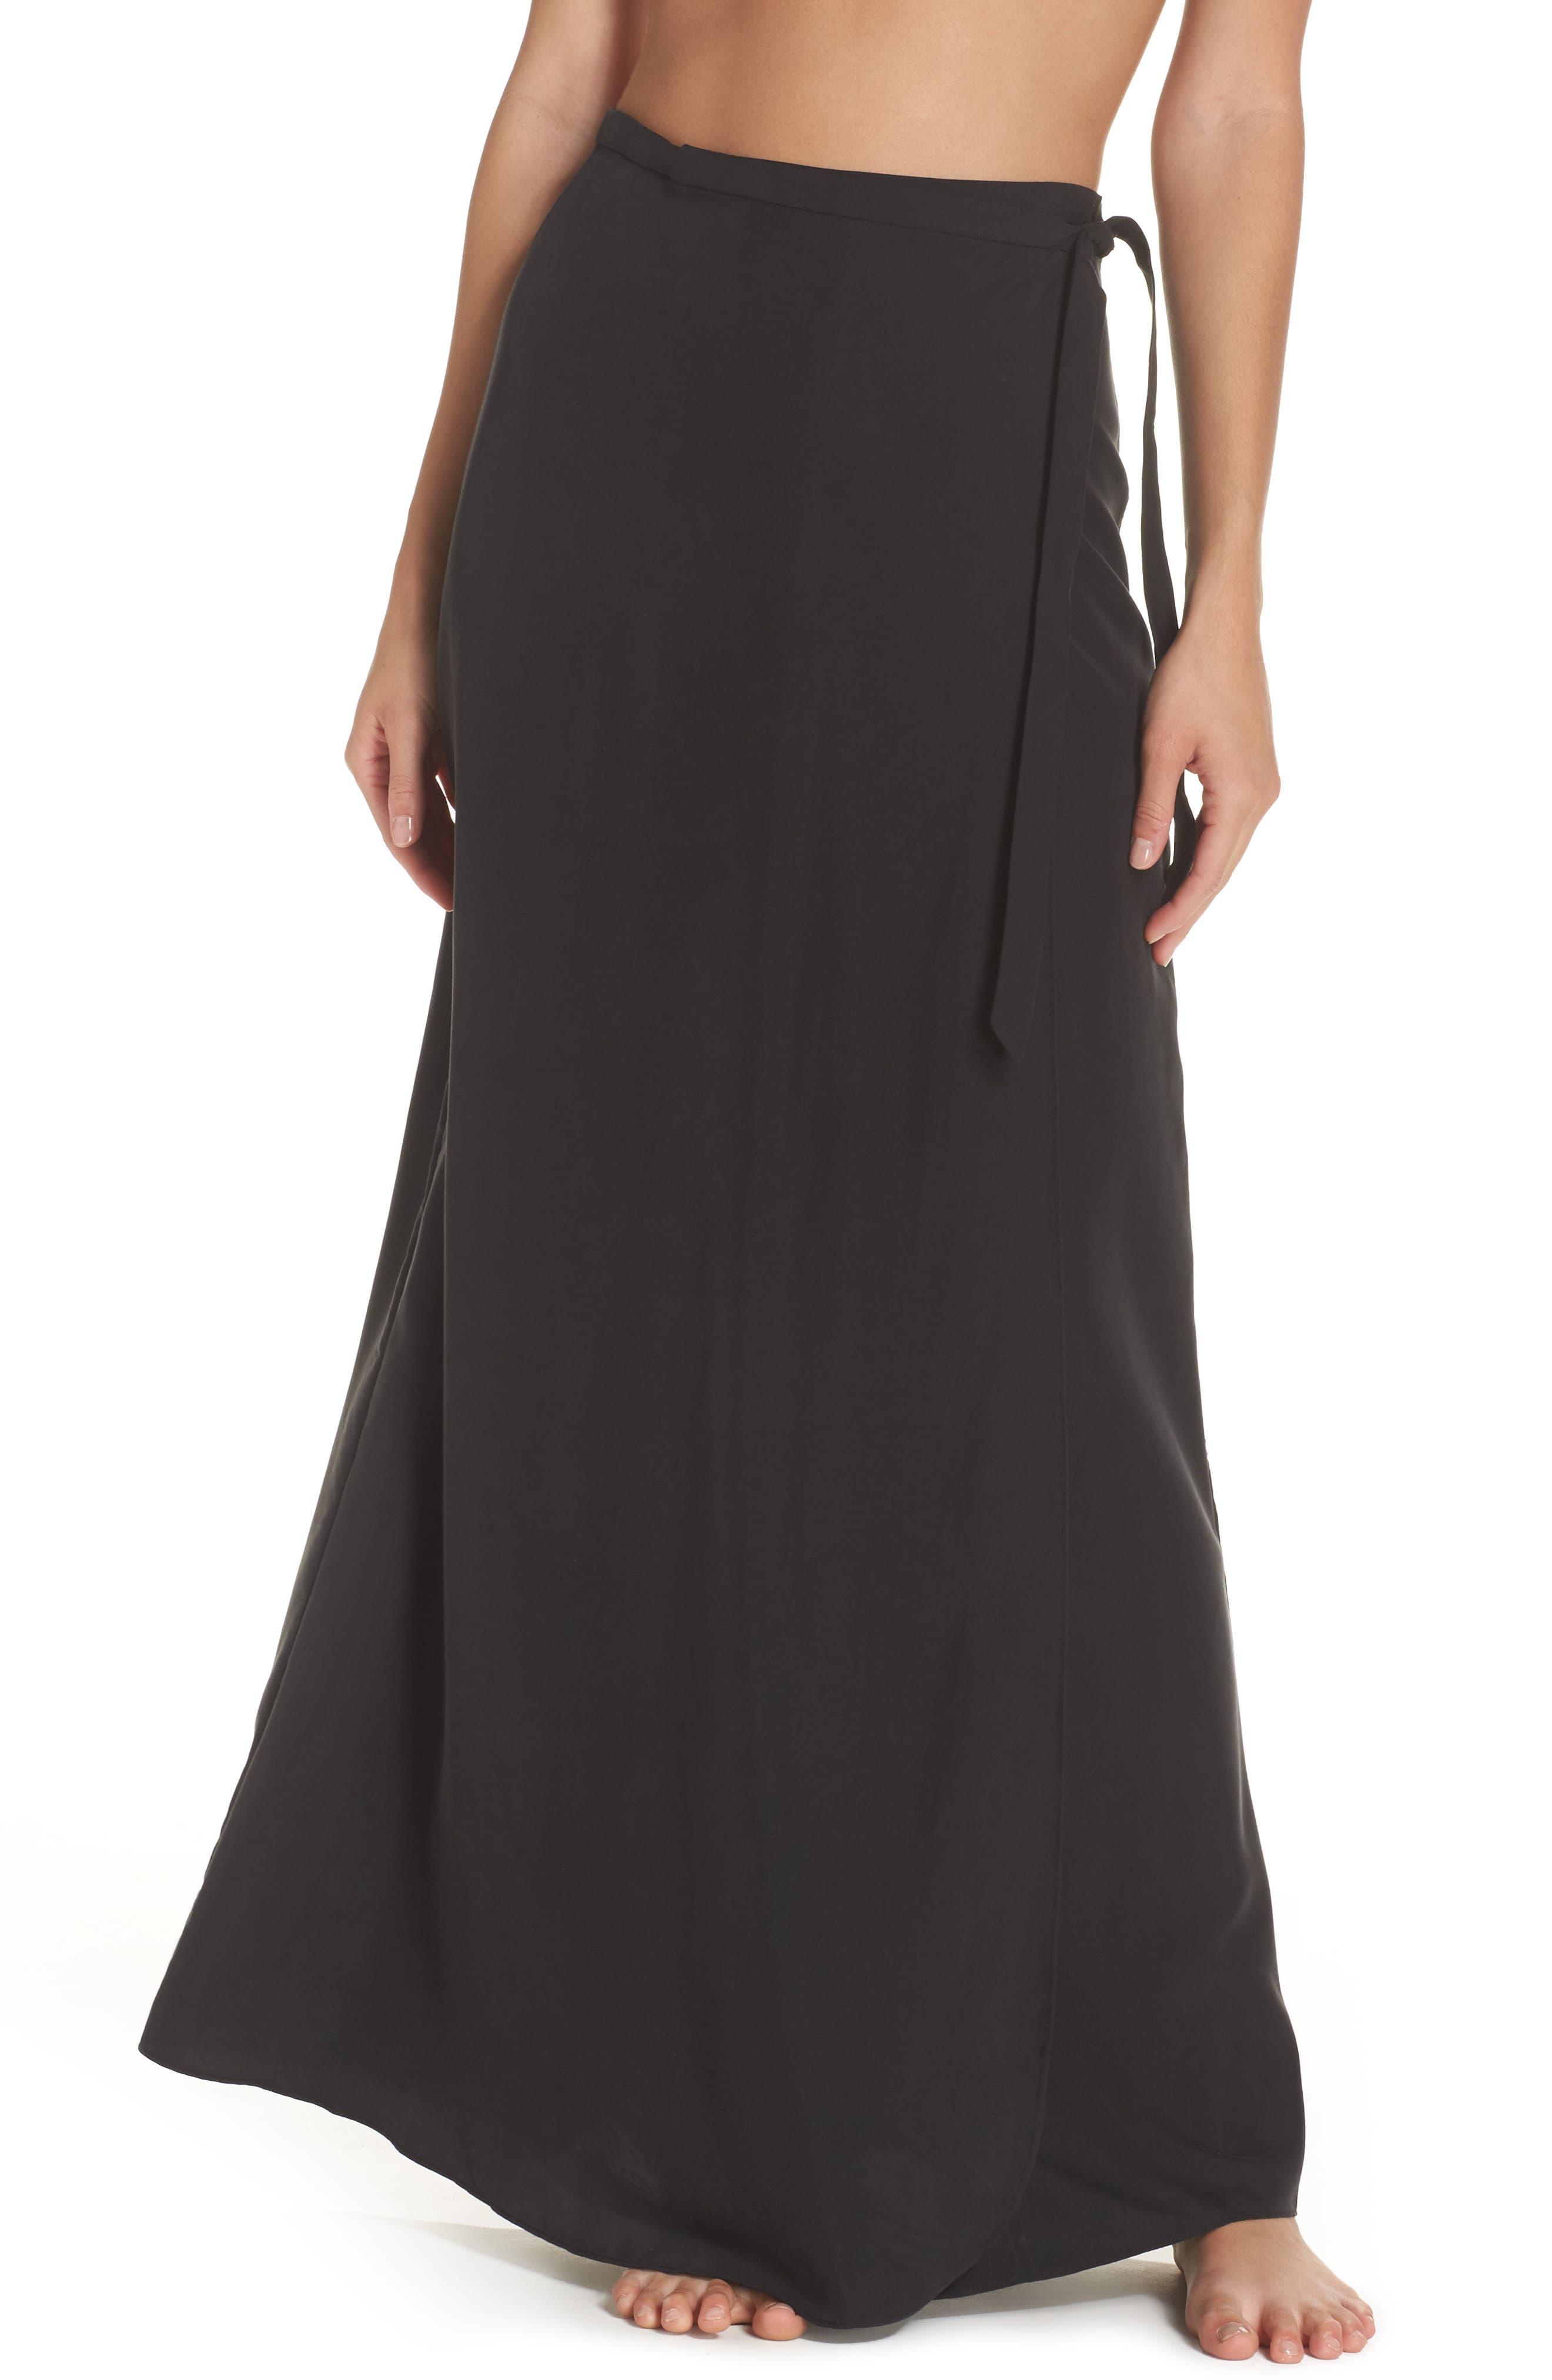 Lasting Impressions Cover-Up Maxi Skirt,                             Main thumbnail 1, color,                             001